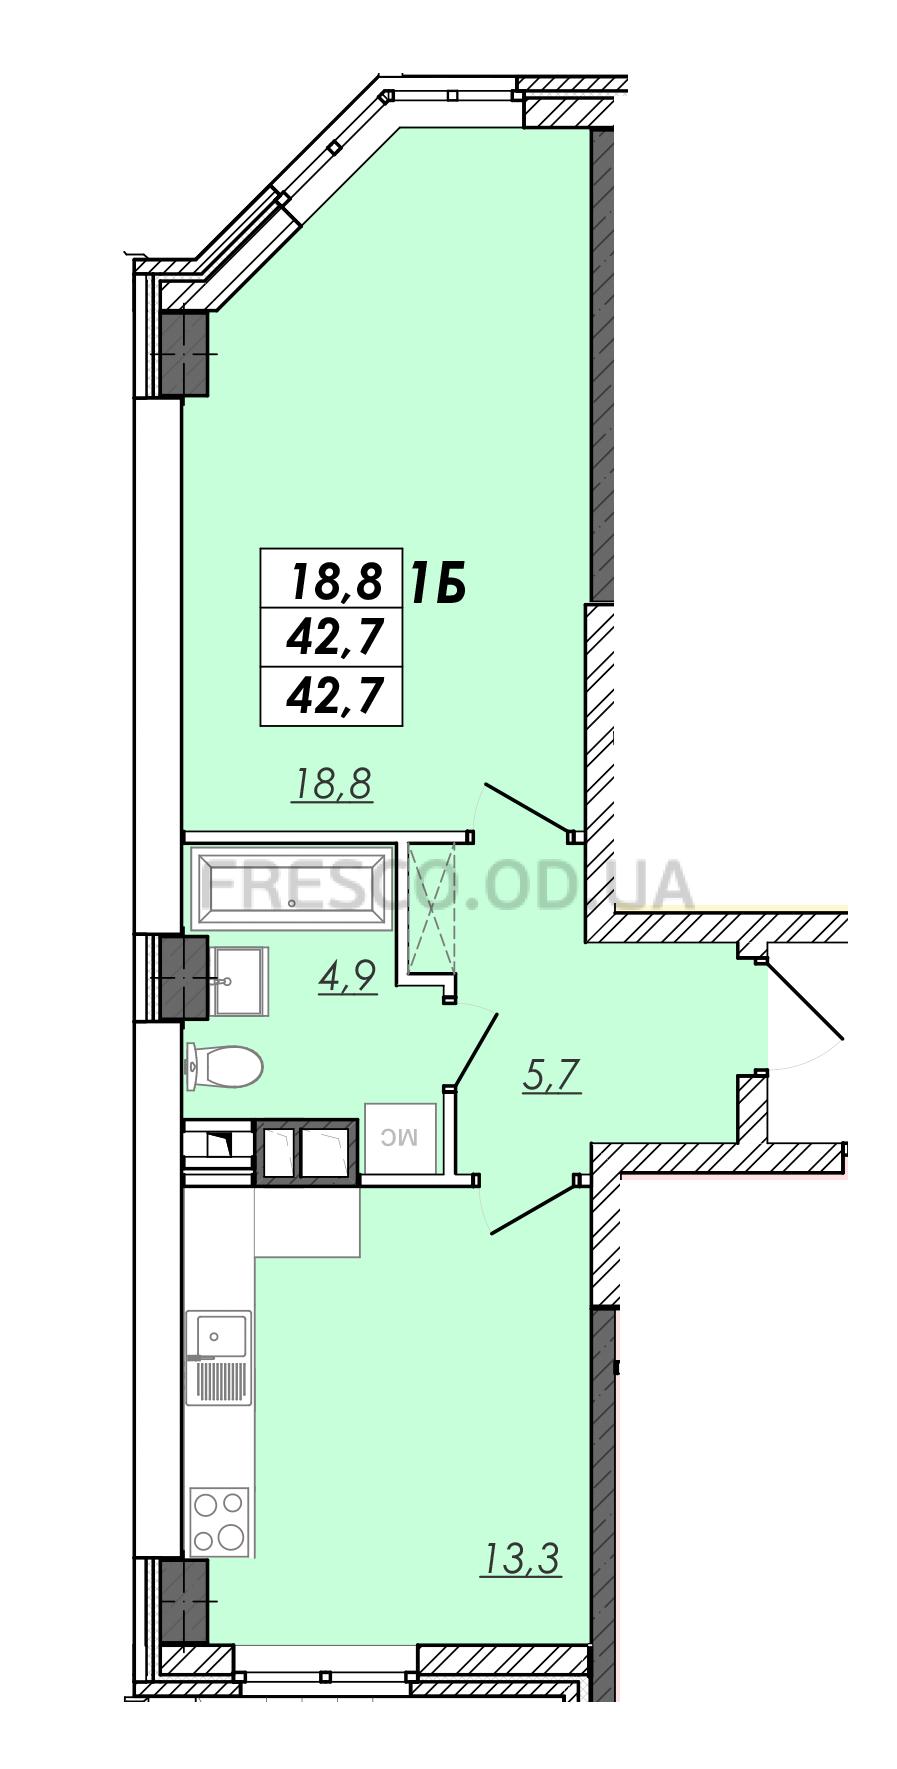 Однокомнатная - ЖК RealPark (Реал Парк)$23912Площадь:42,7m²